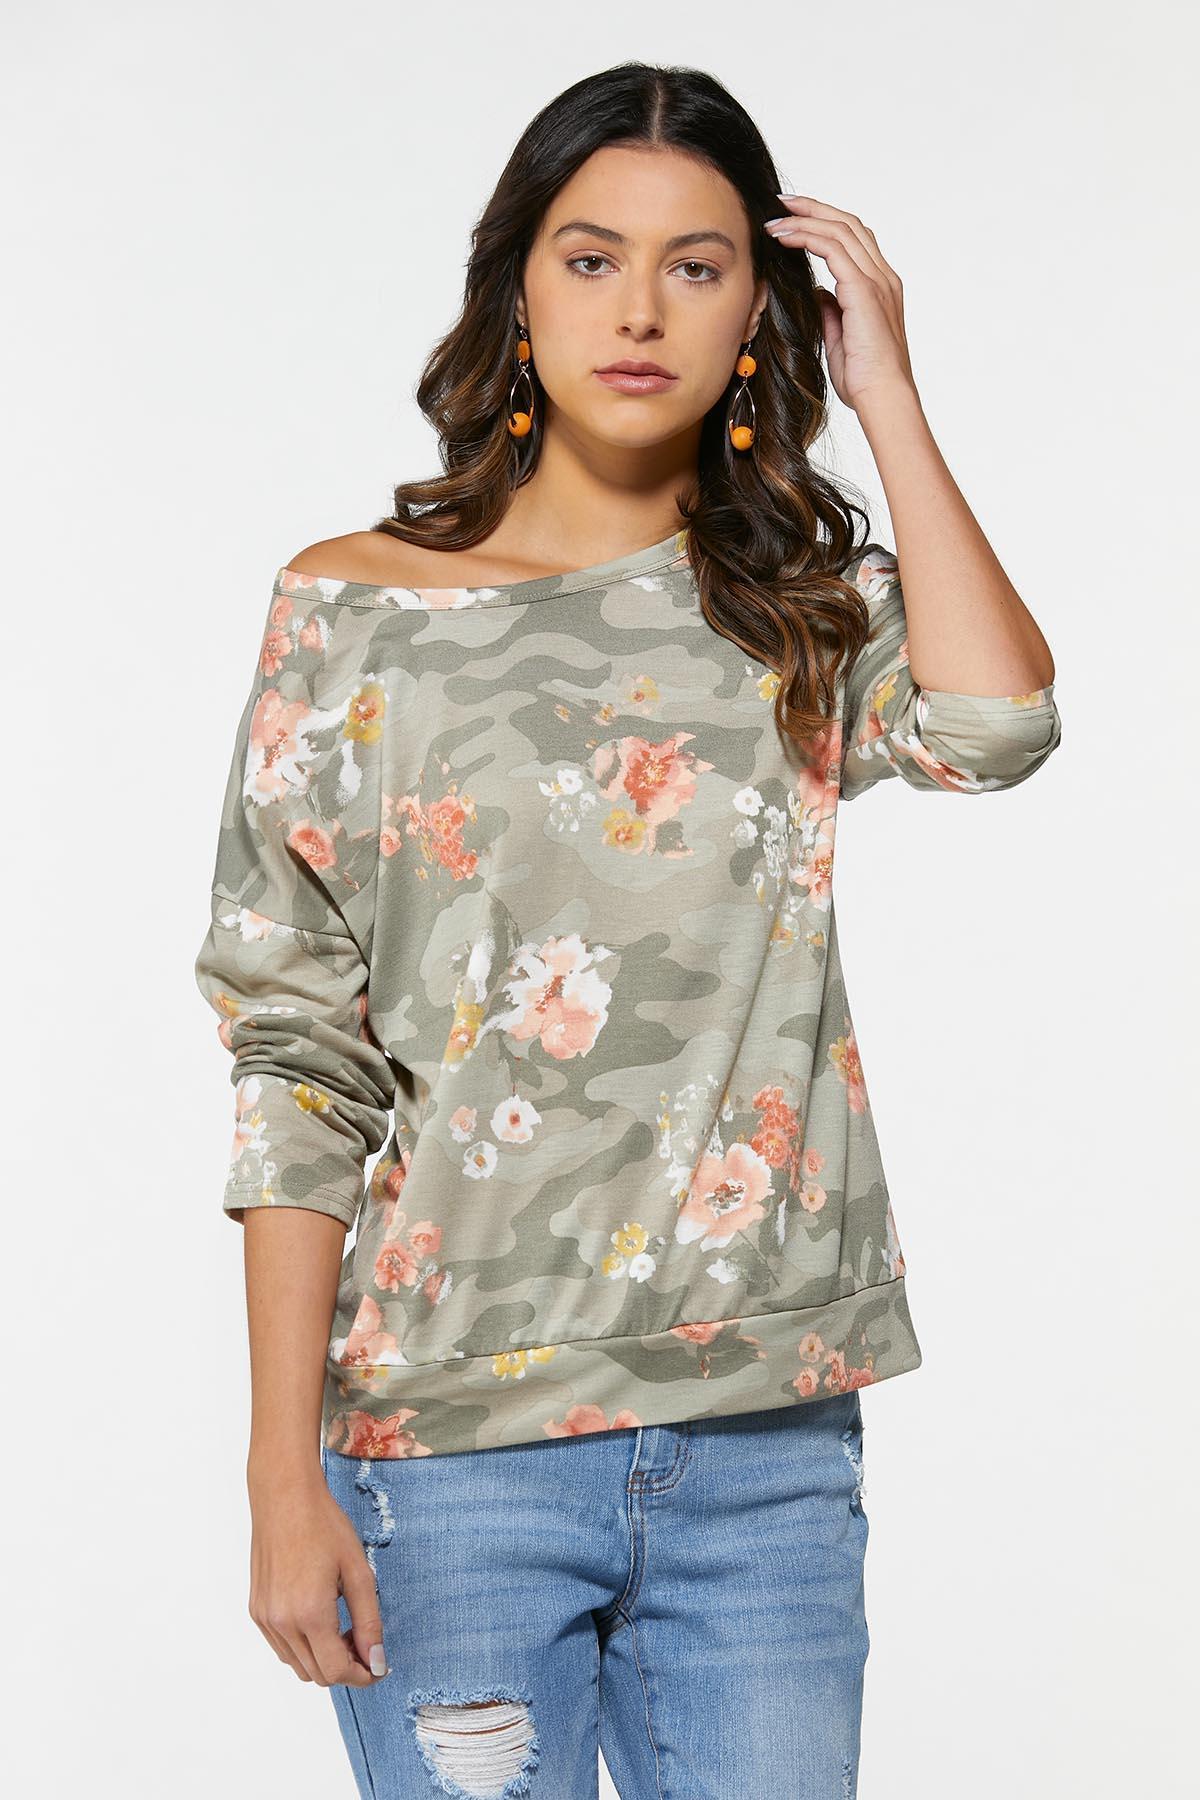 Olive Floral Sweatshirt (Item #44740925)